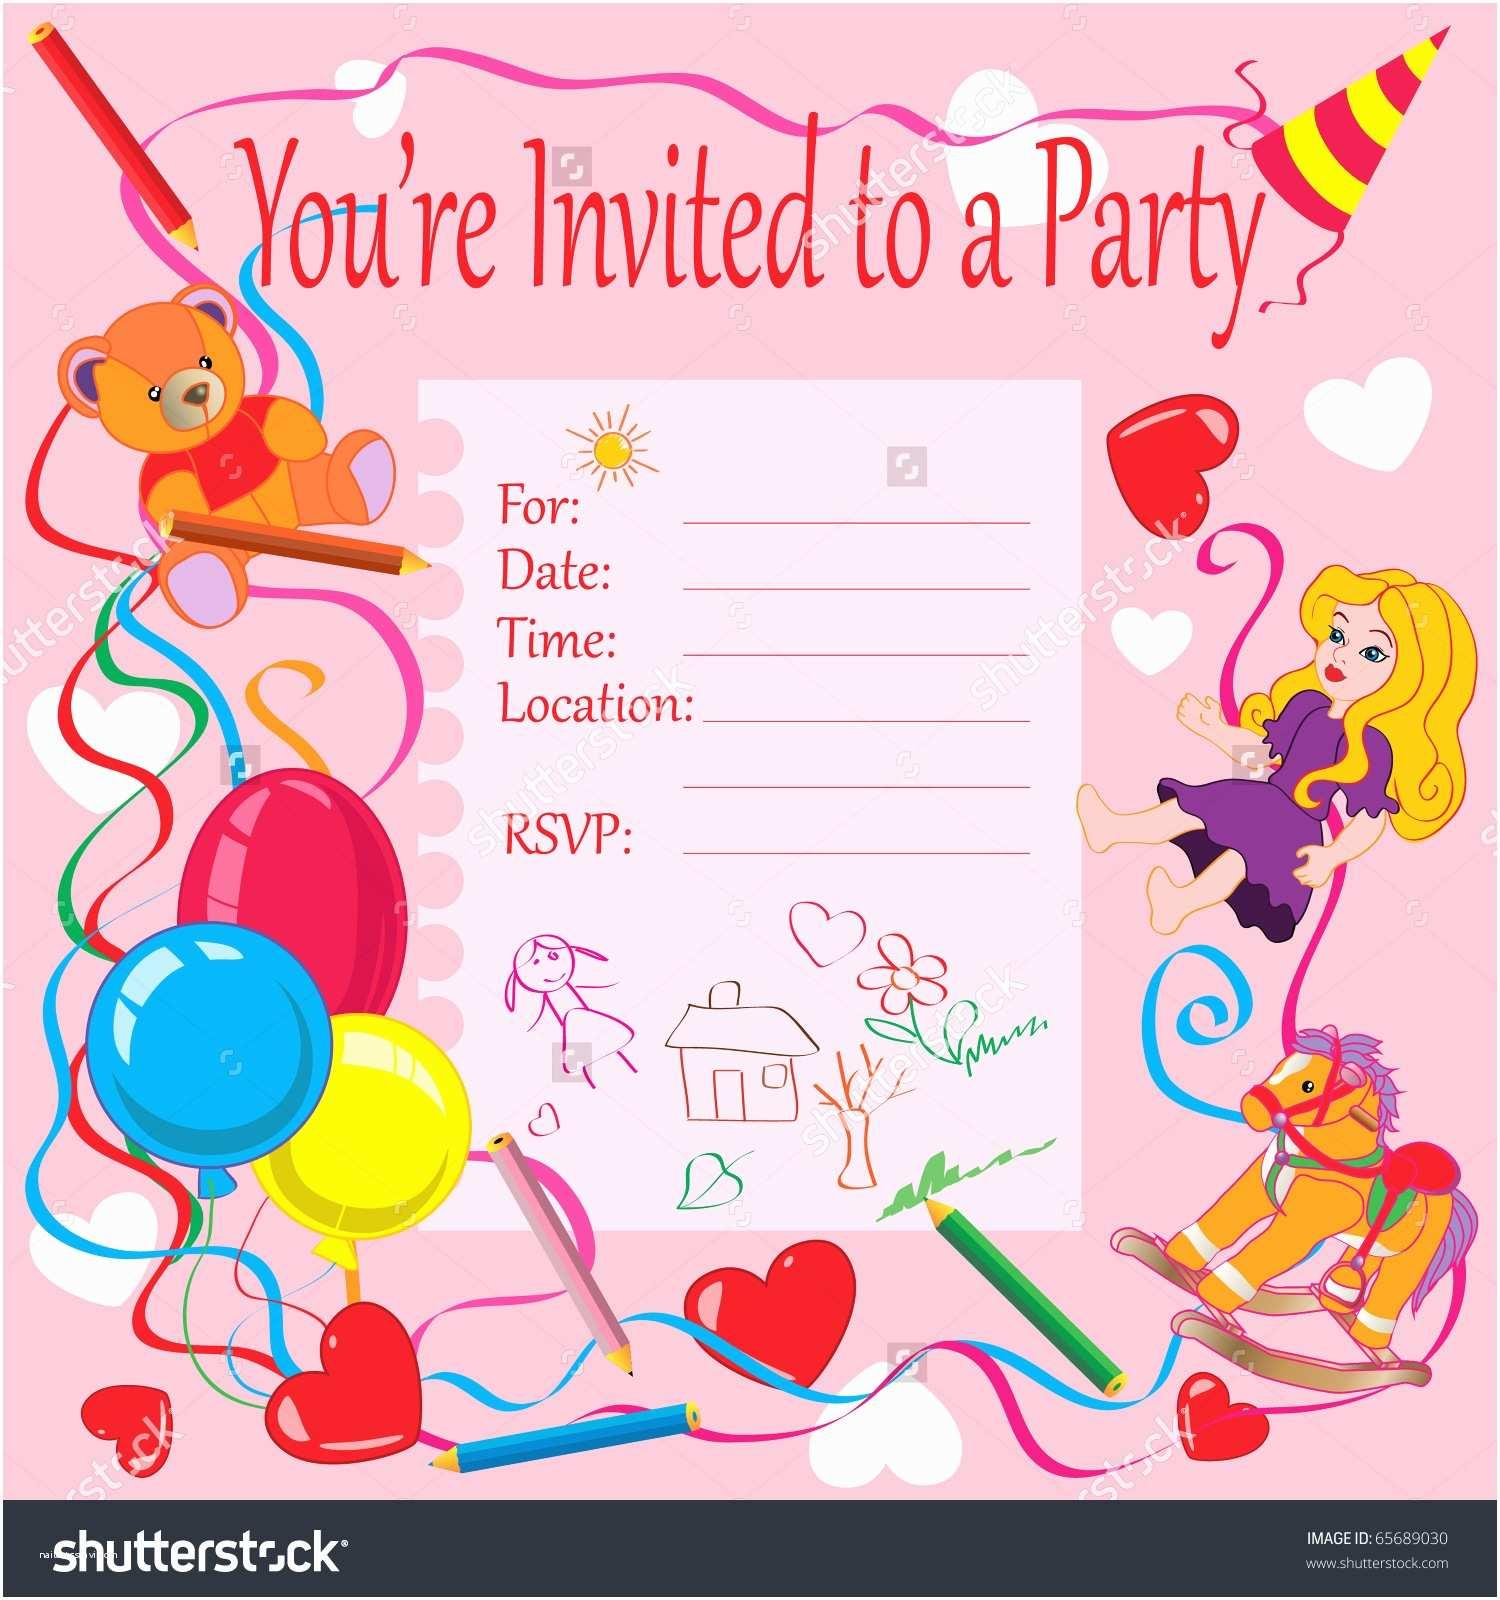 Kids Birthday Party Invitation Wording Card Invitation Ideas Modern Sample Wedding Invitation